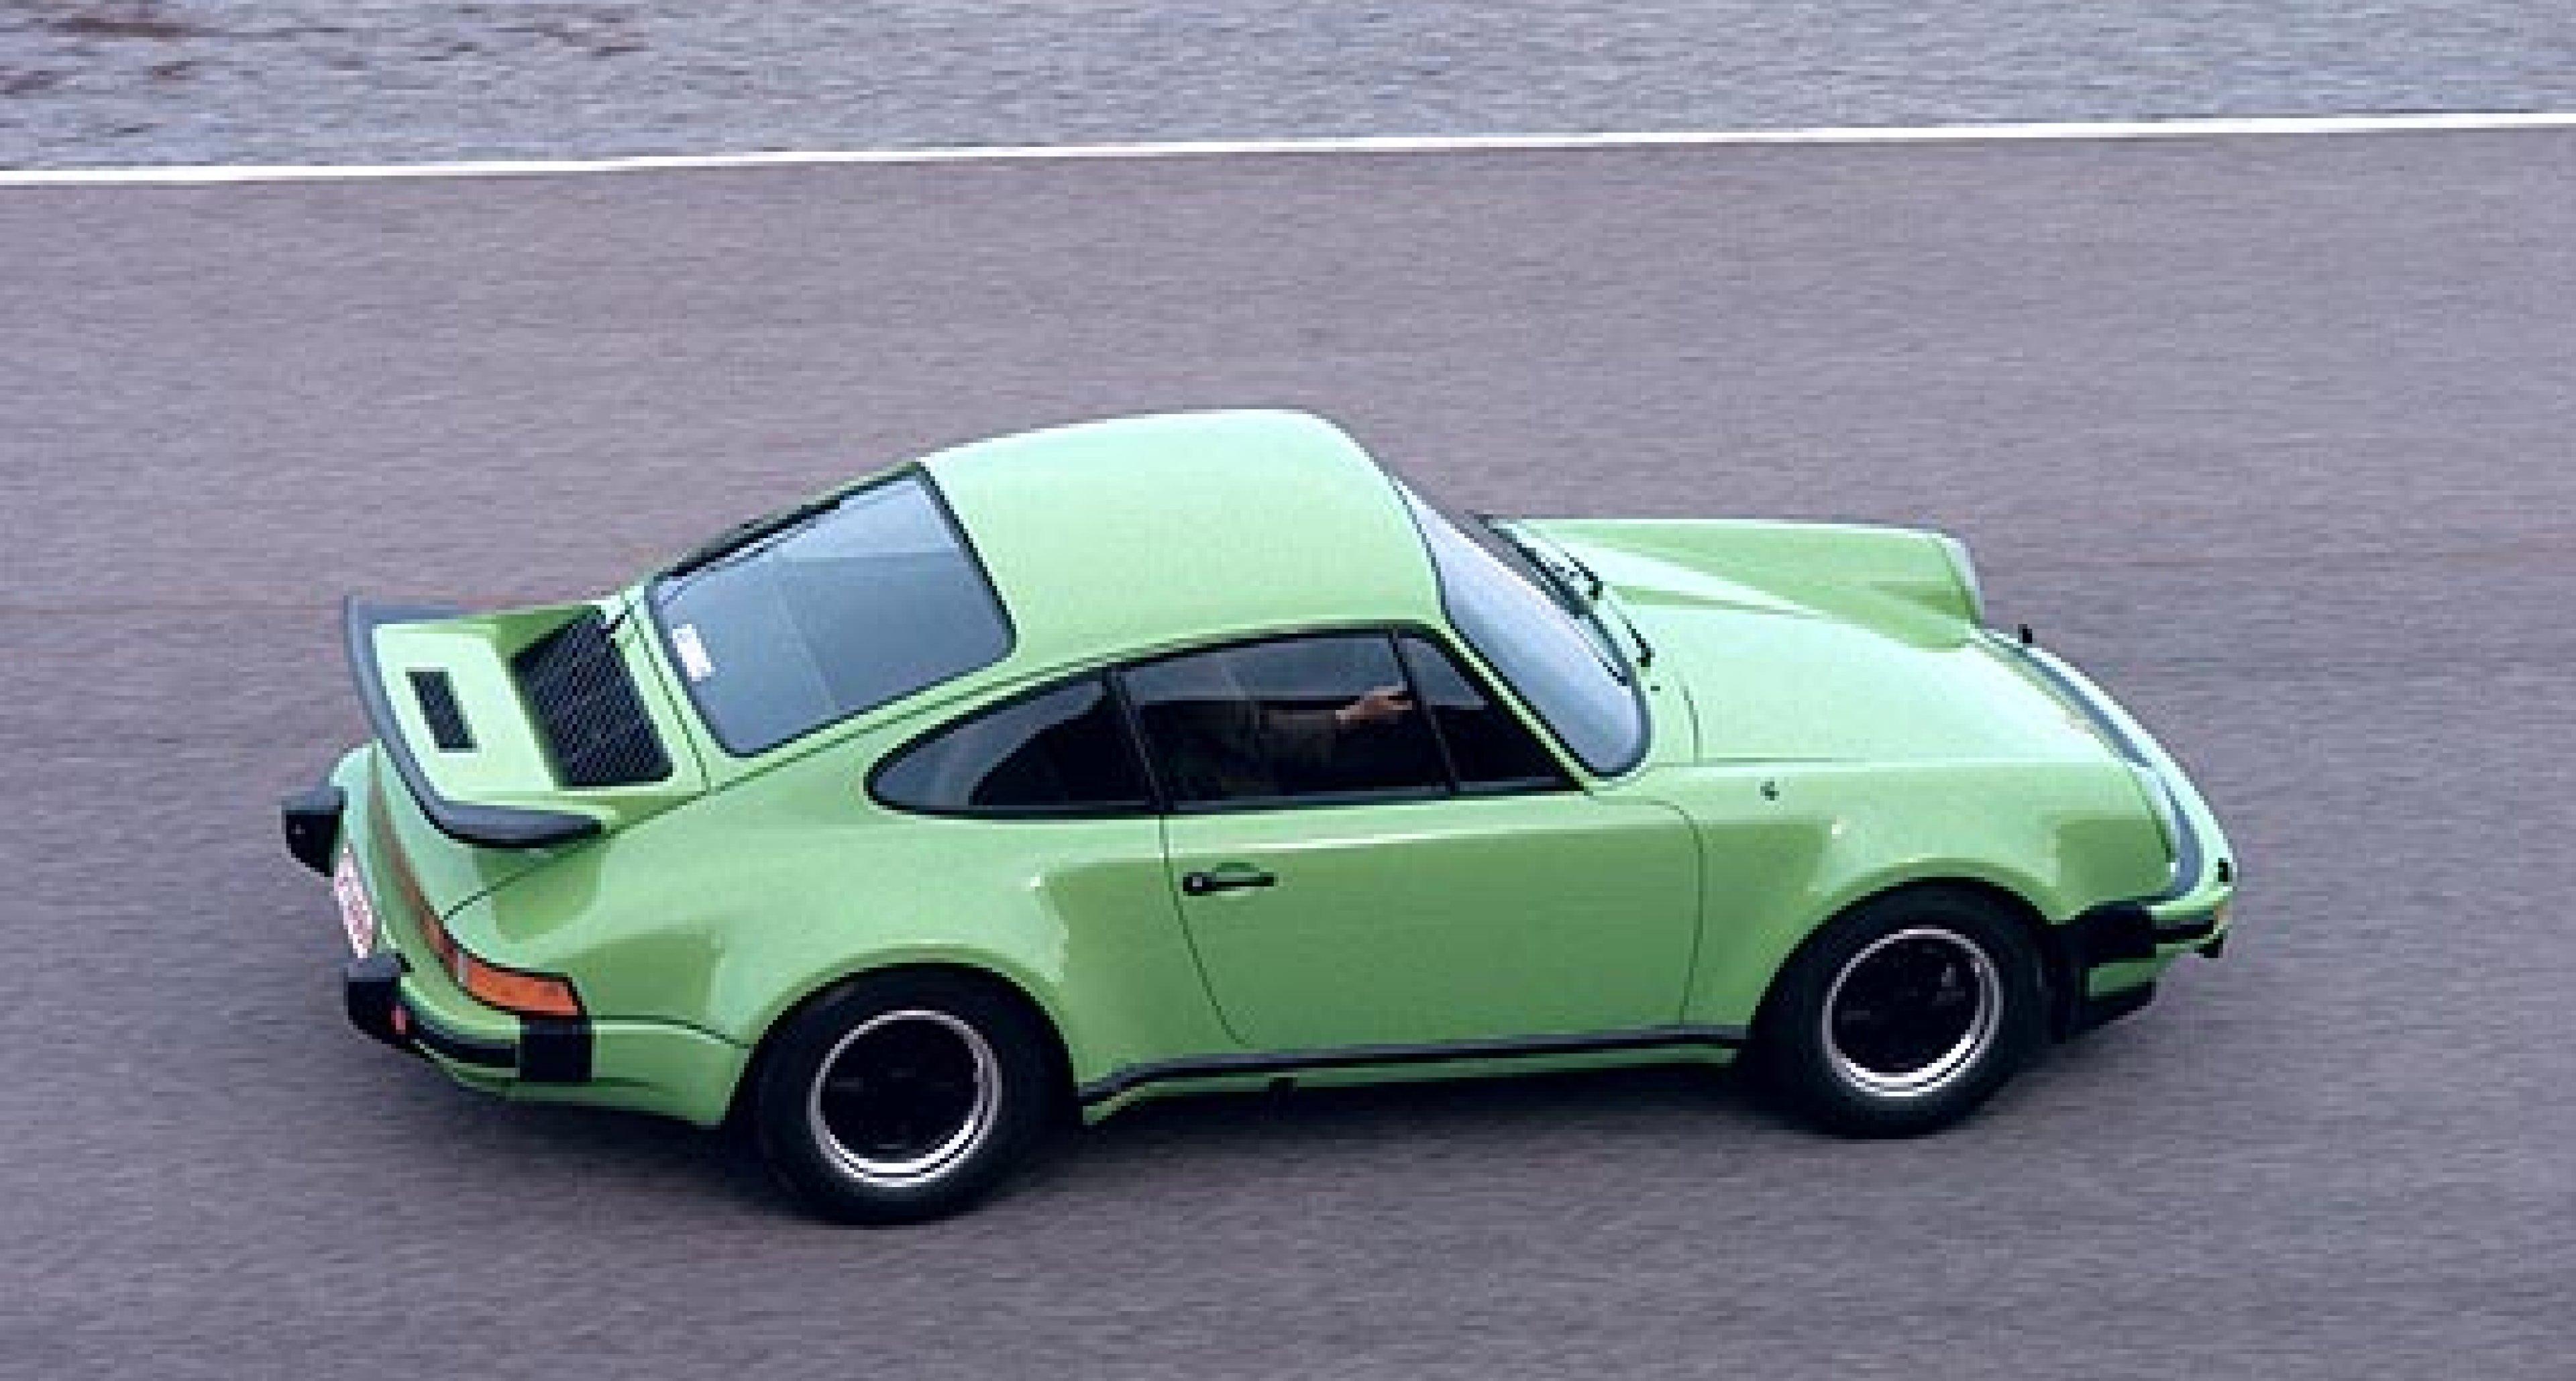 Modern Classics: Porsche 911 turbo